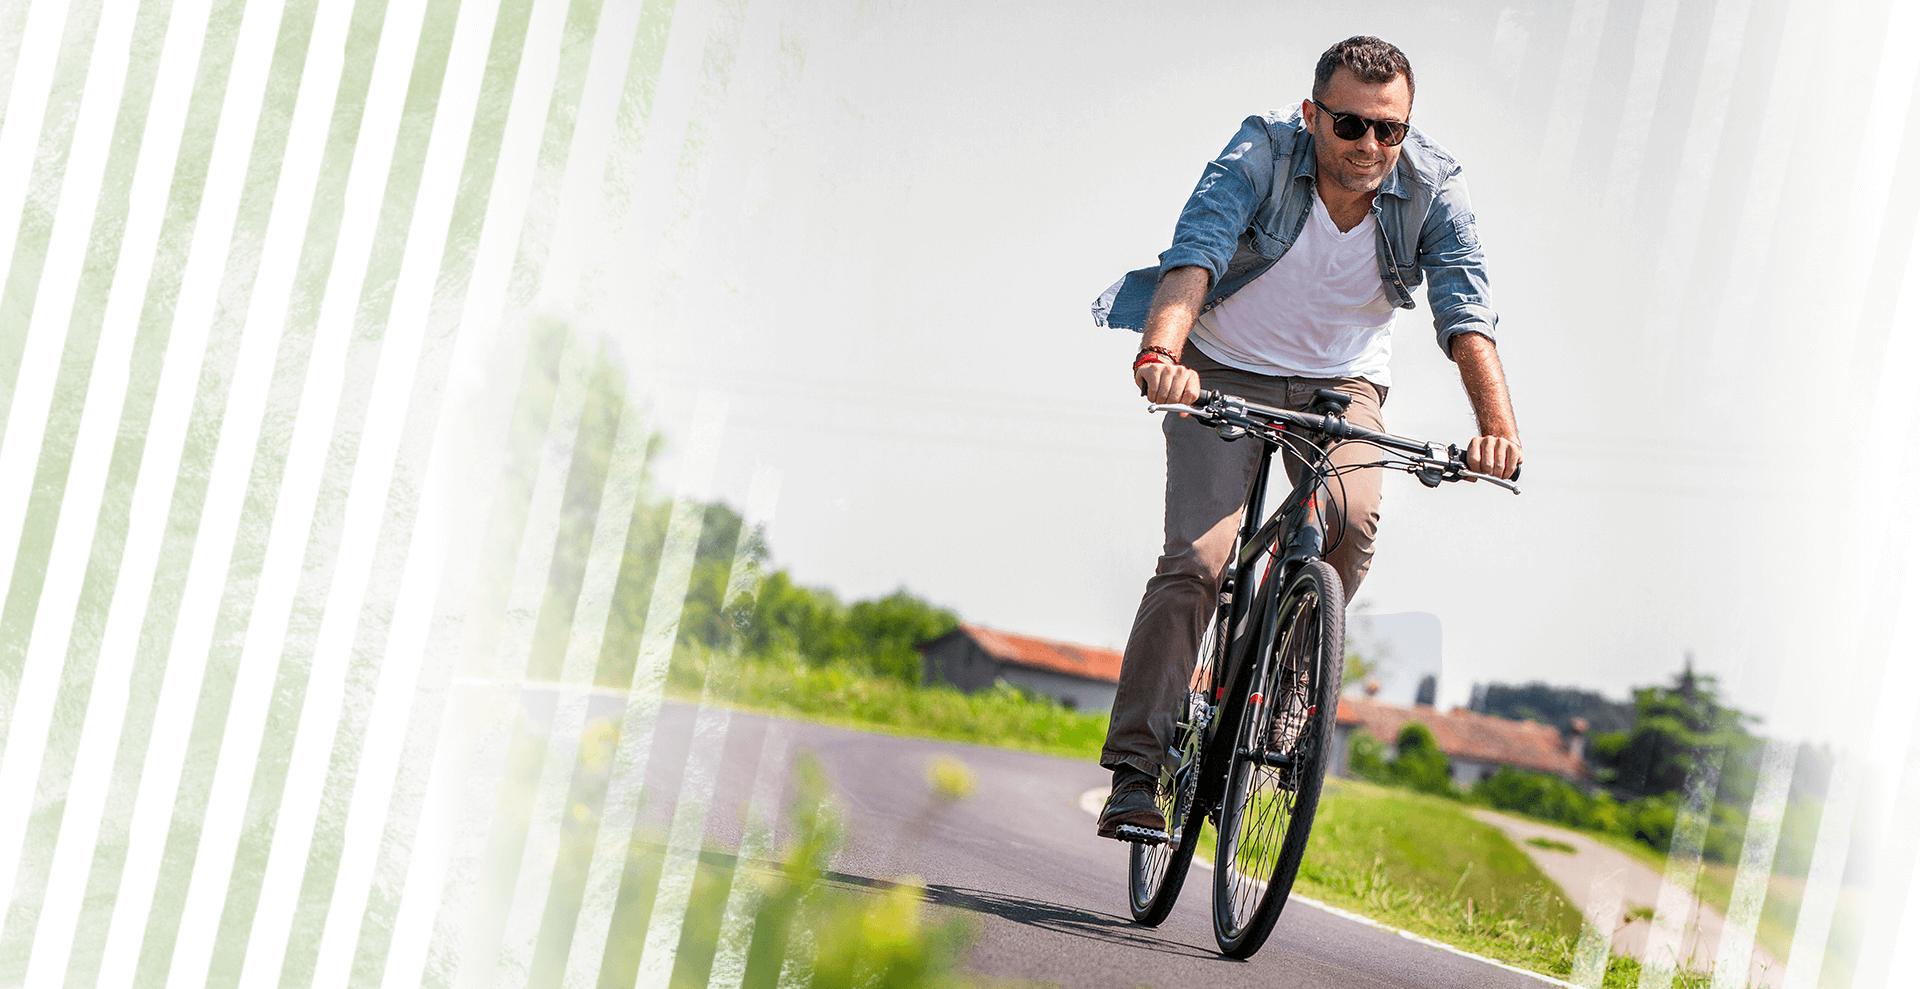 Egal, ob City-Bike, Rennrad, Pedelec oder Mountainbike, JEDES RAD KANN EIN JOBRAD SEIN